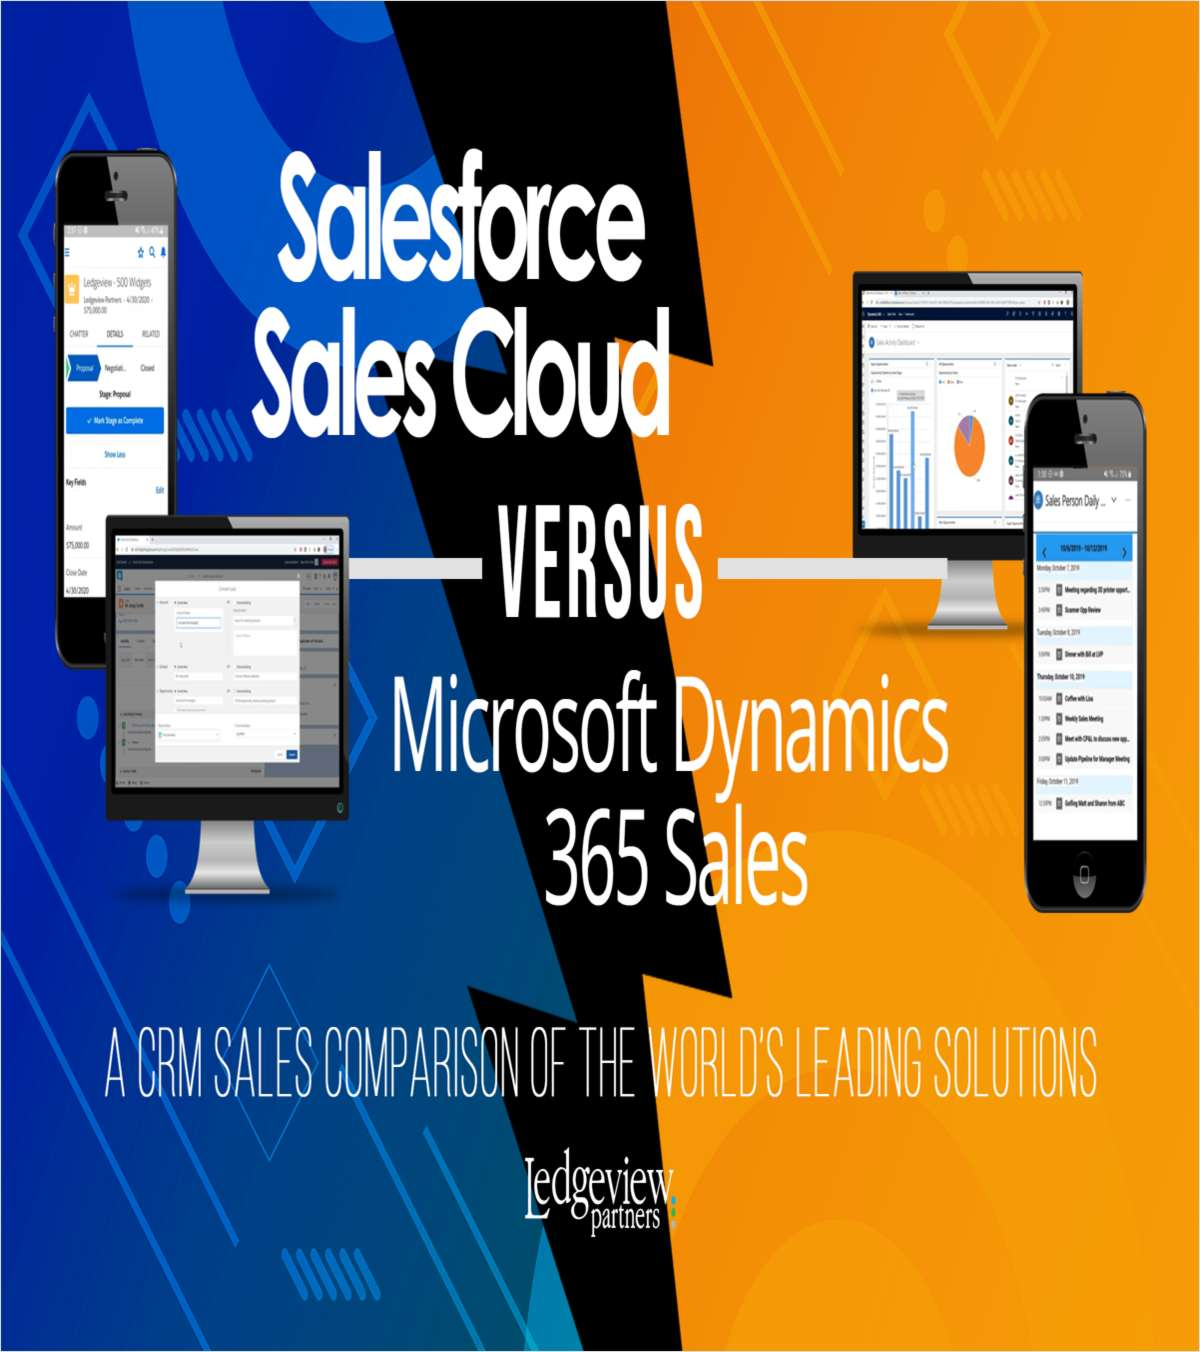 Webinar: Salesforce vs. Microsoft Dynamics 365